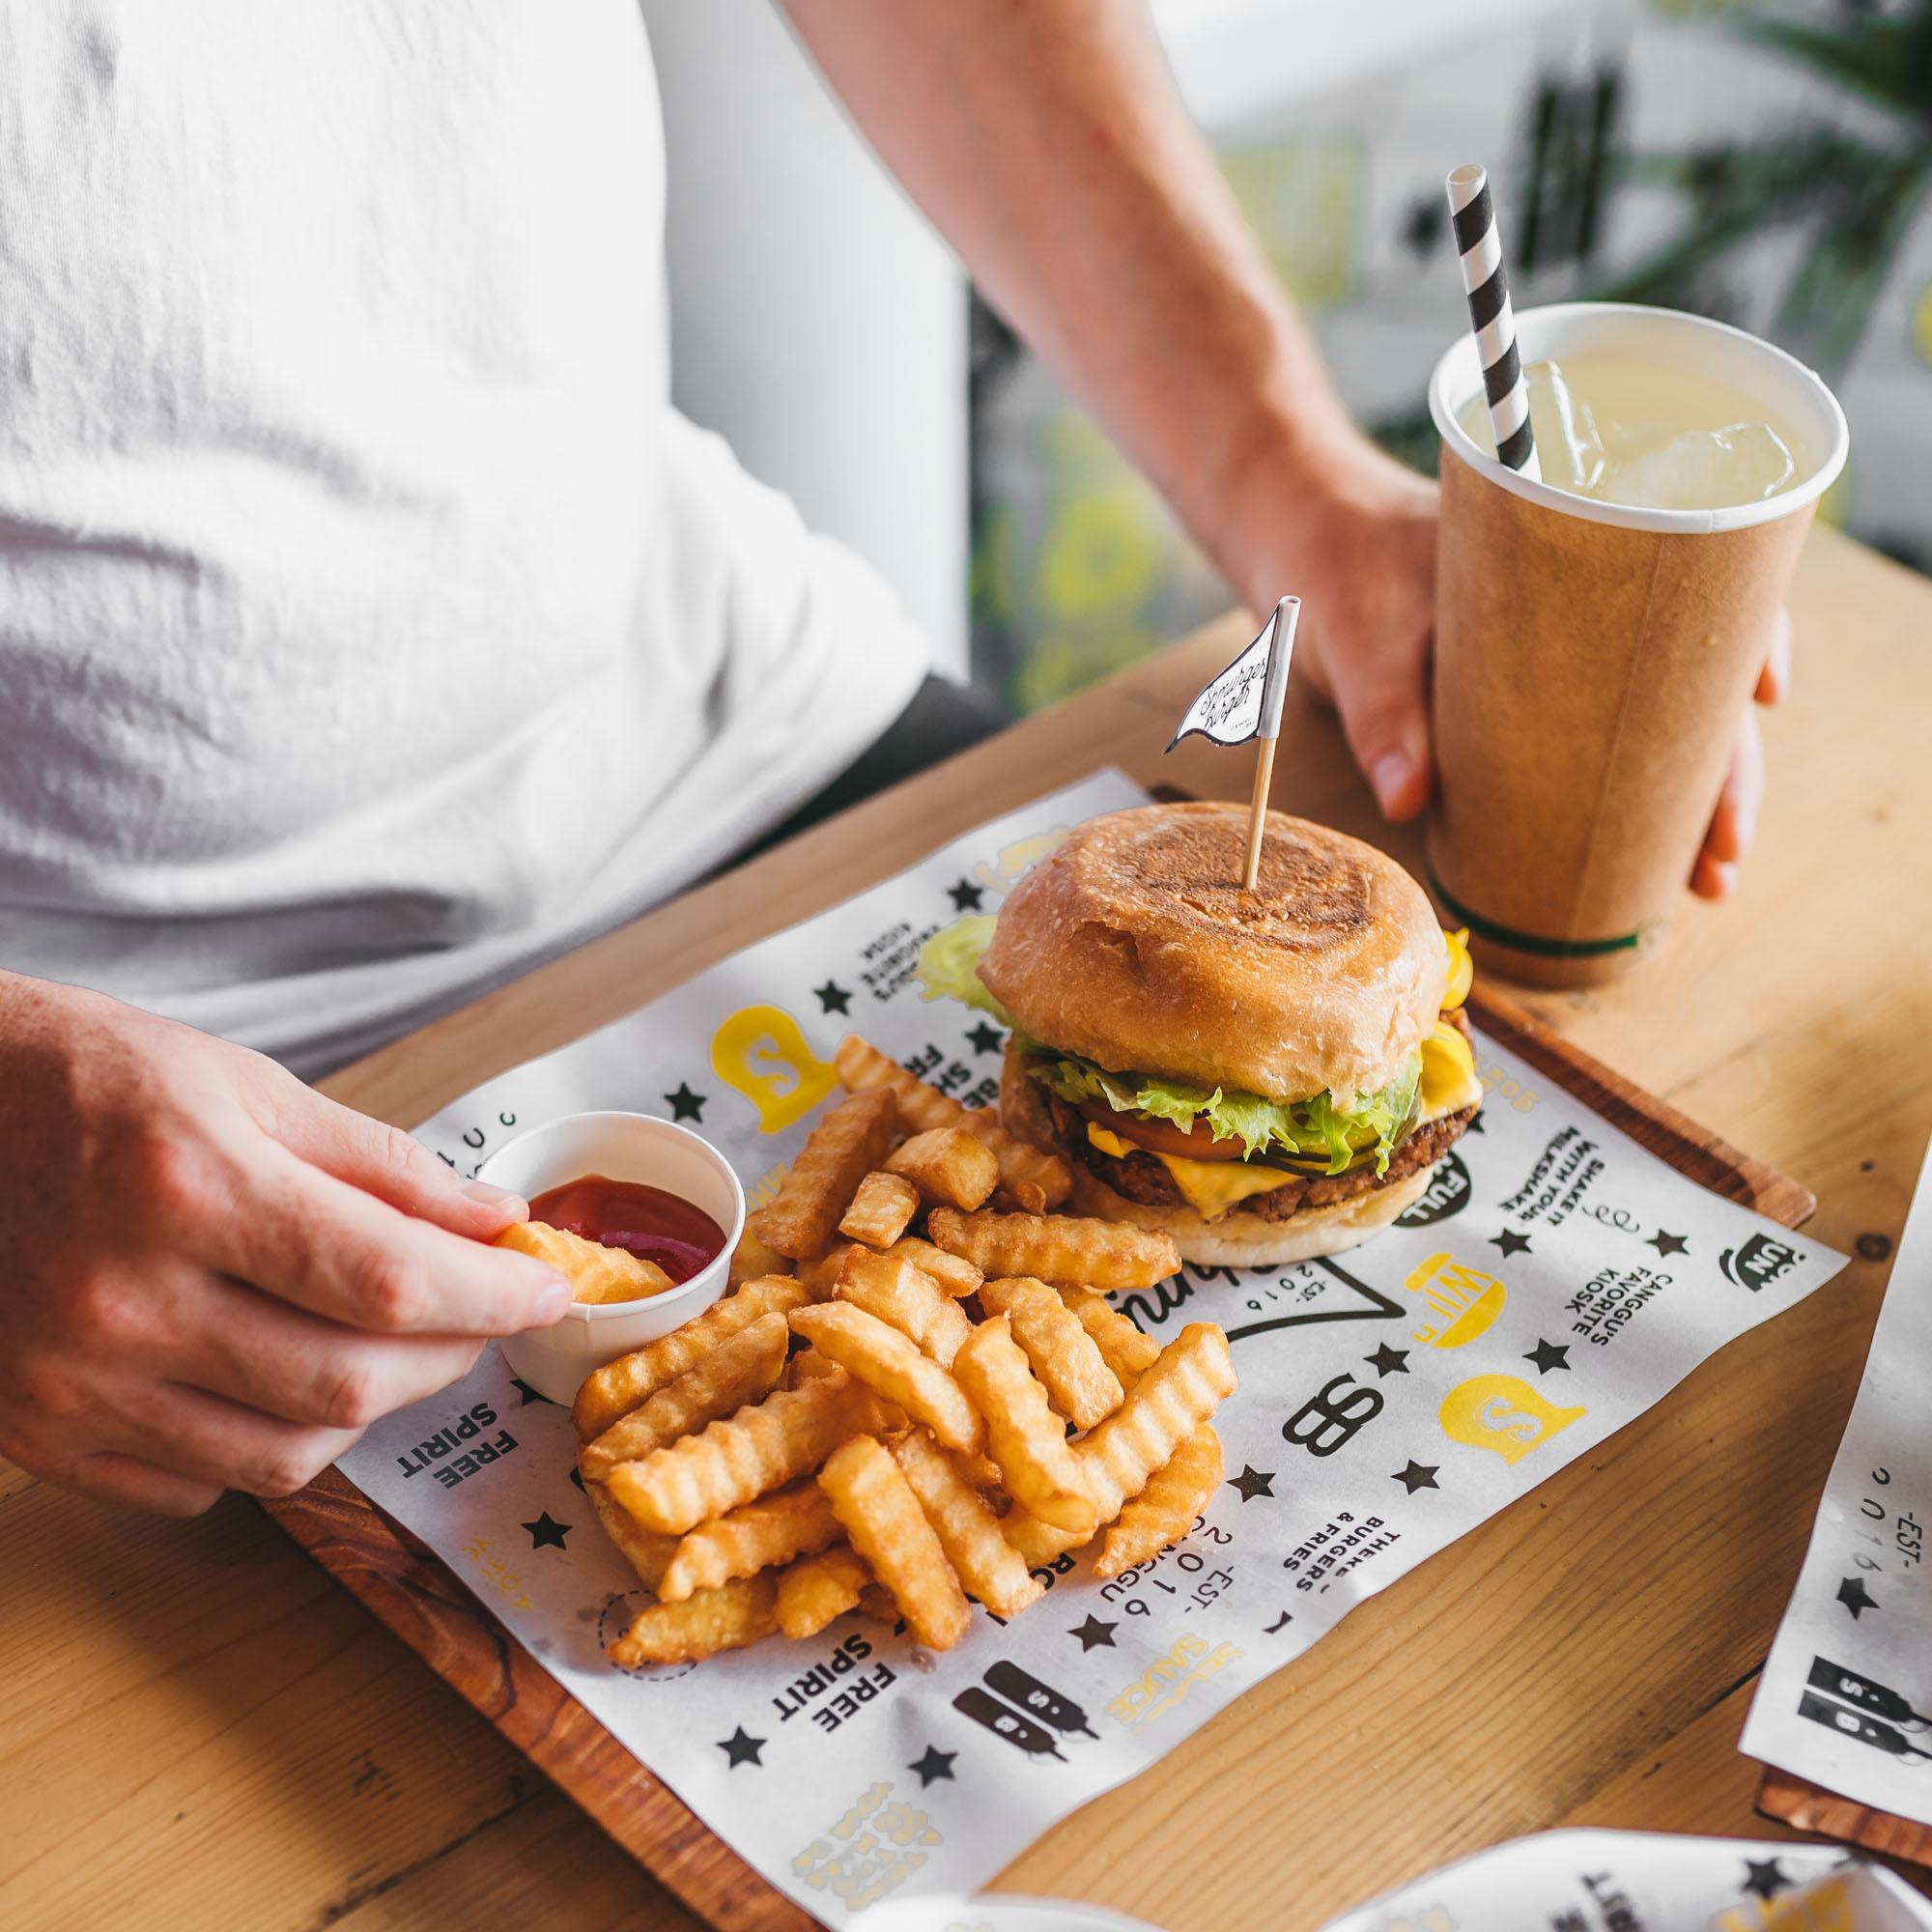 keira-mason-shmurger-burger-best-burgerjpg.jpg